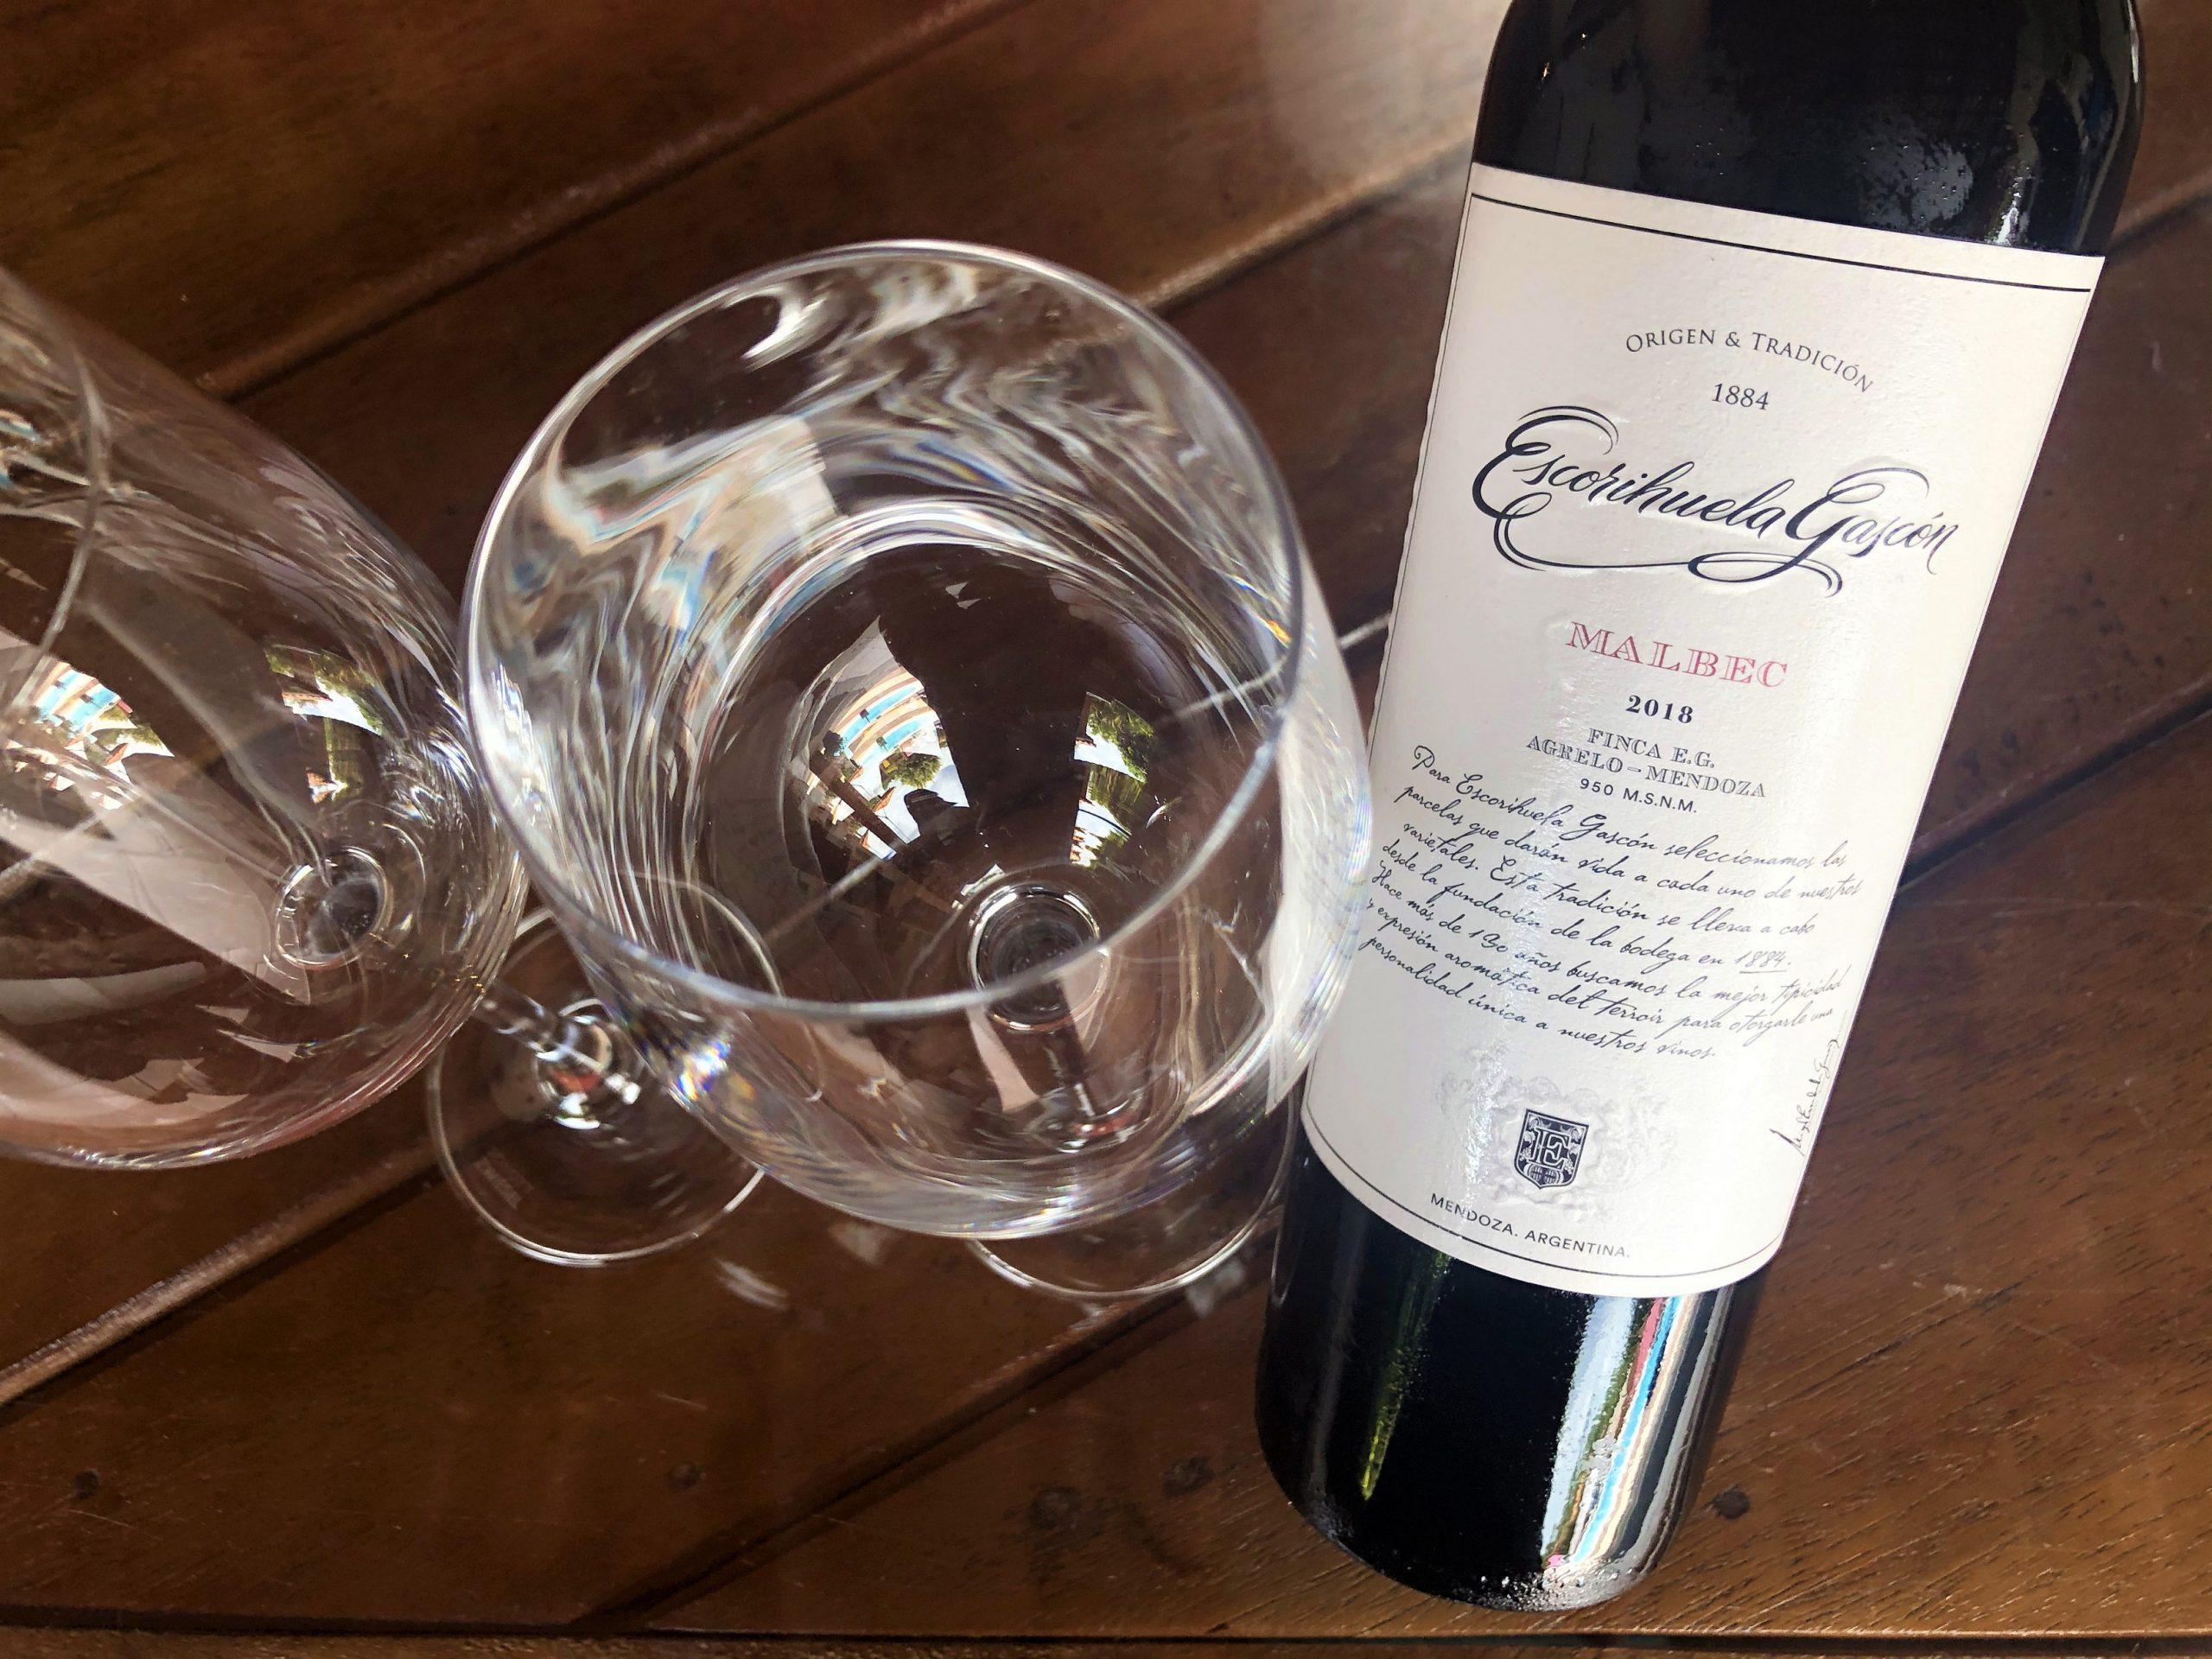 Vinho argentino Escorihuela Gascon Malbec